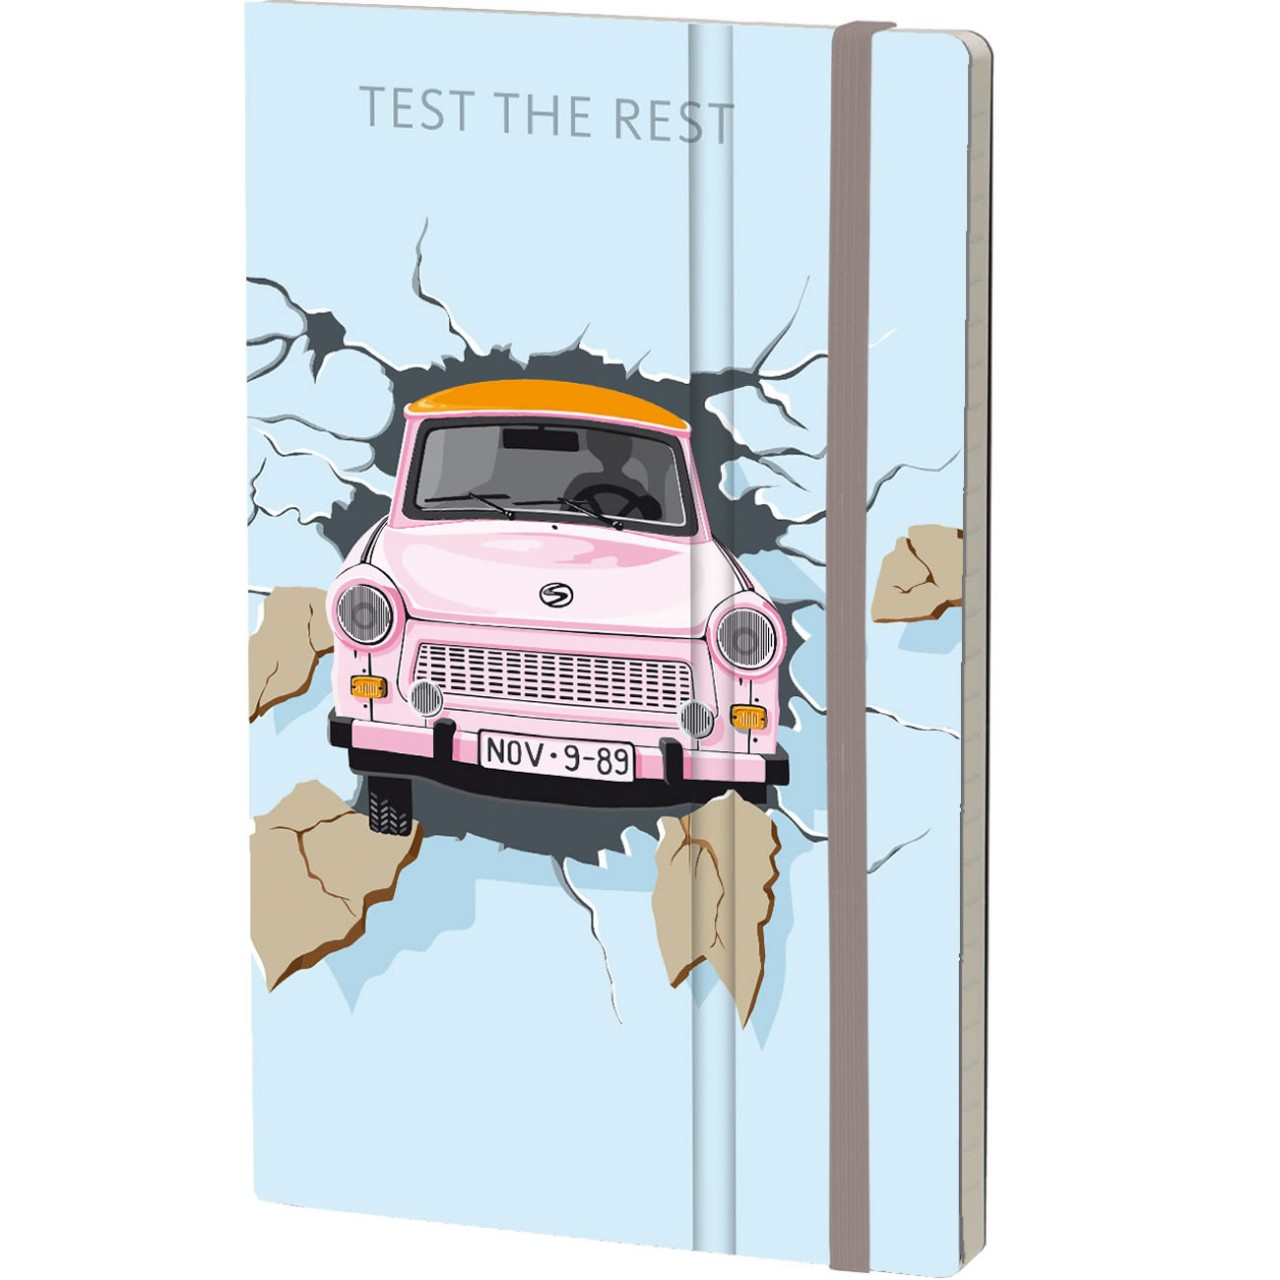 Stifflex Notizbuch THE WALL 9 x 14 cm 144 S., TEST THE REST - BLUE